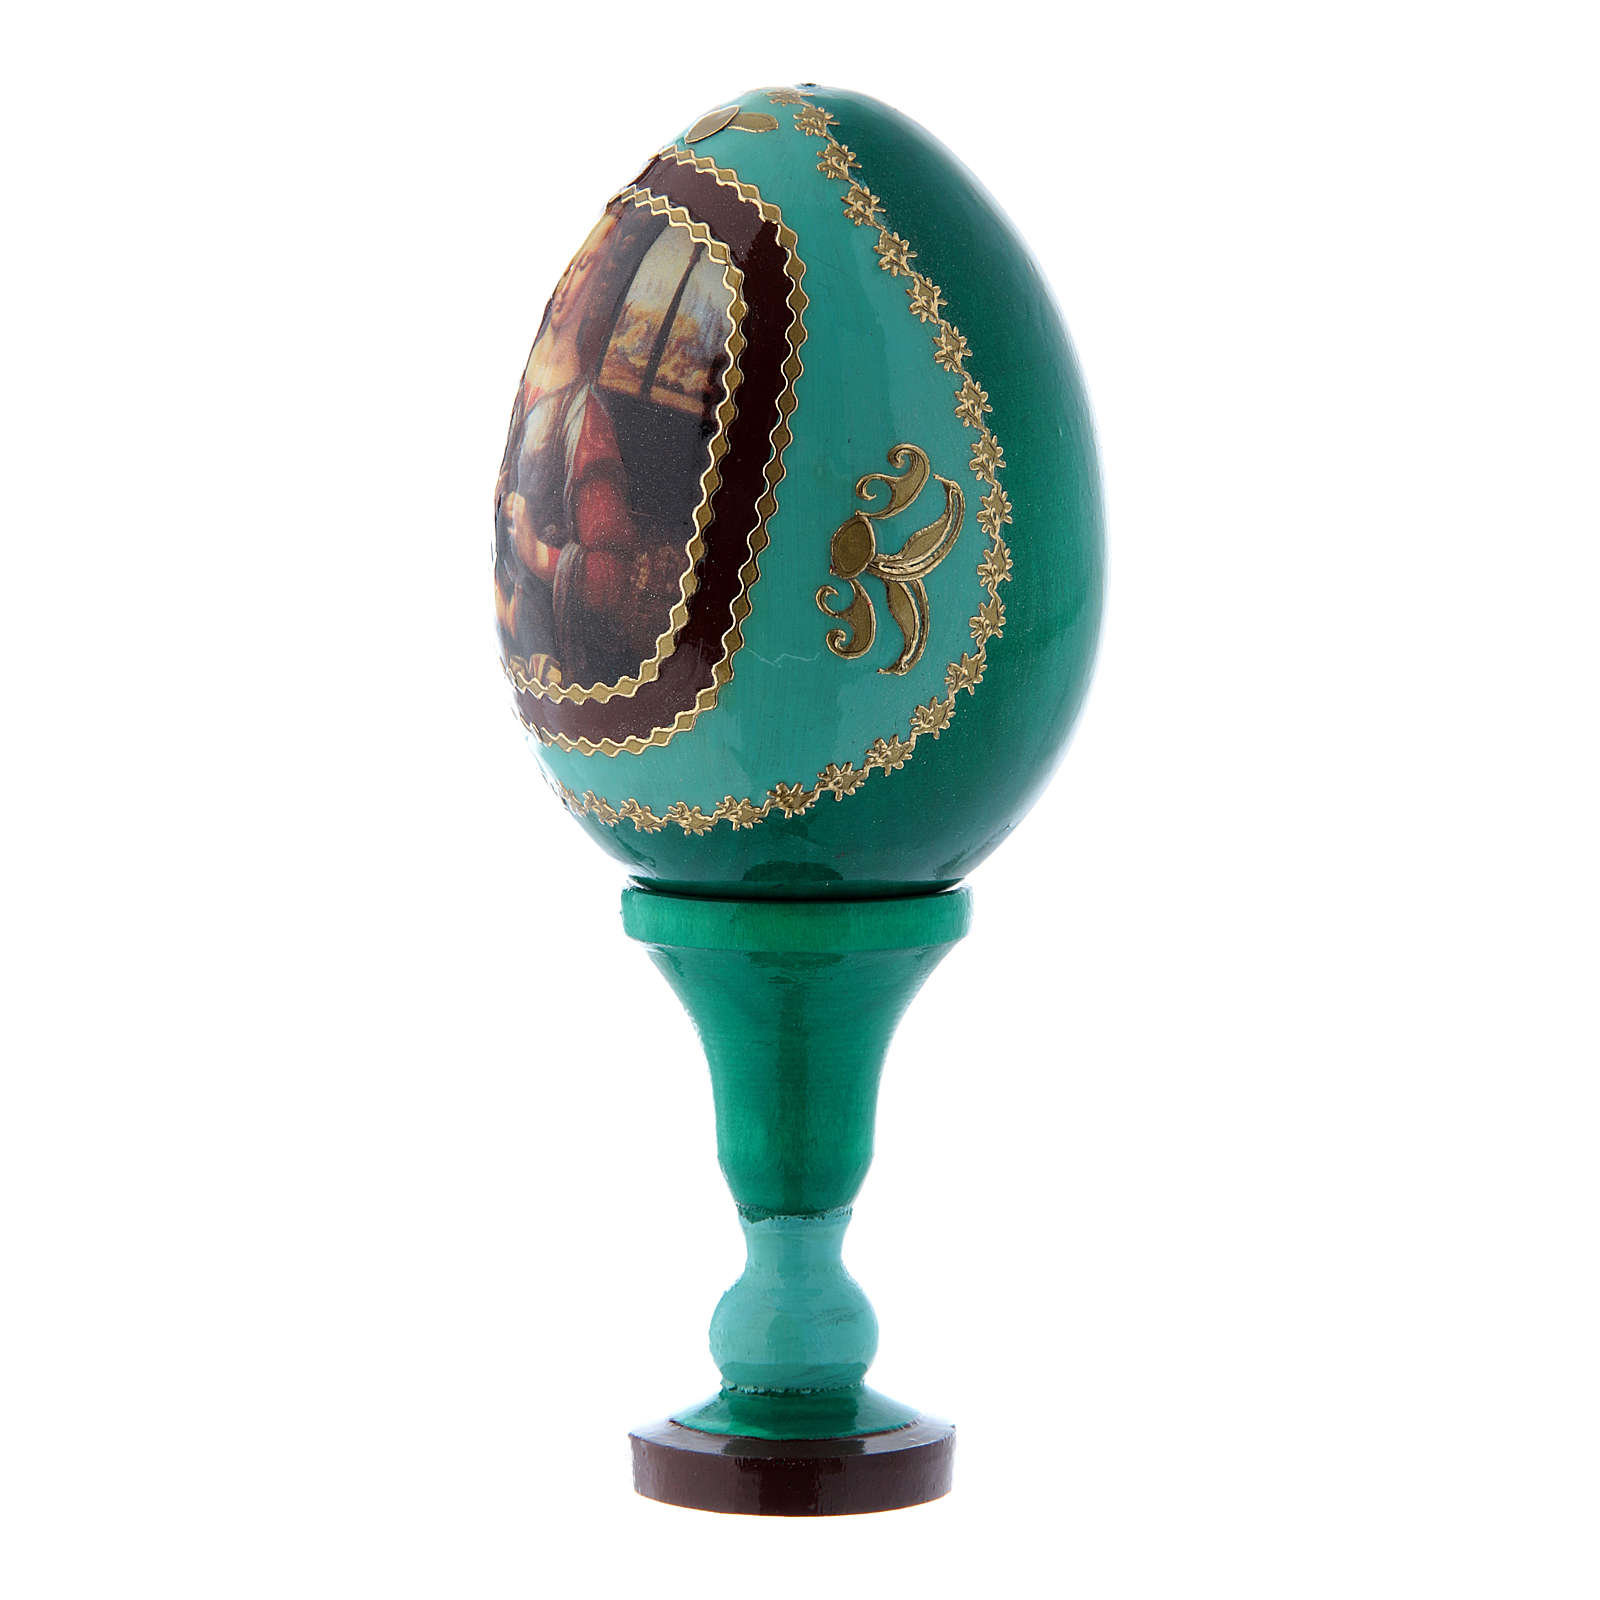 Huevo estilo Fabergé ruso verde Virgen con Niño decoupage h tot 13 cm 4